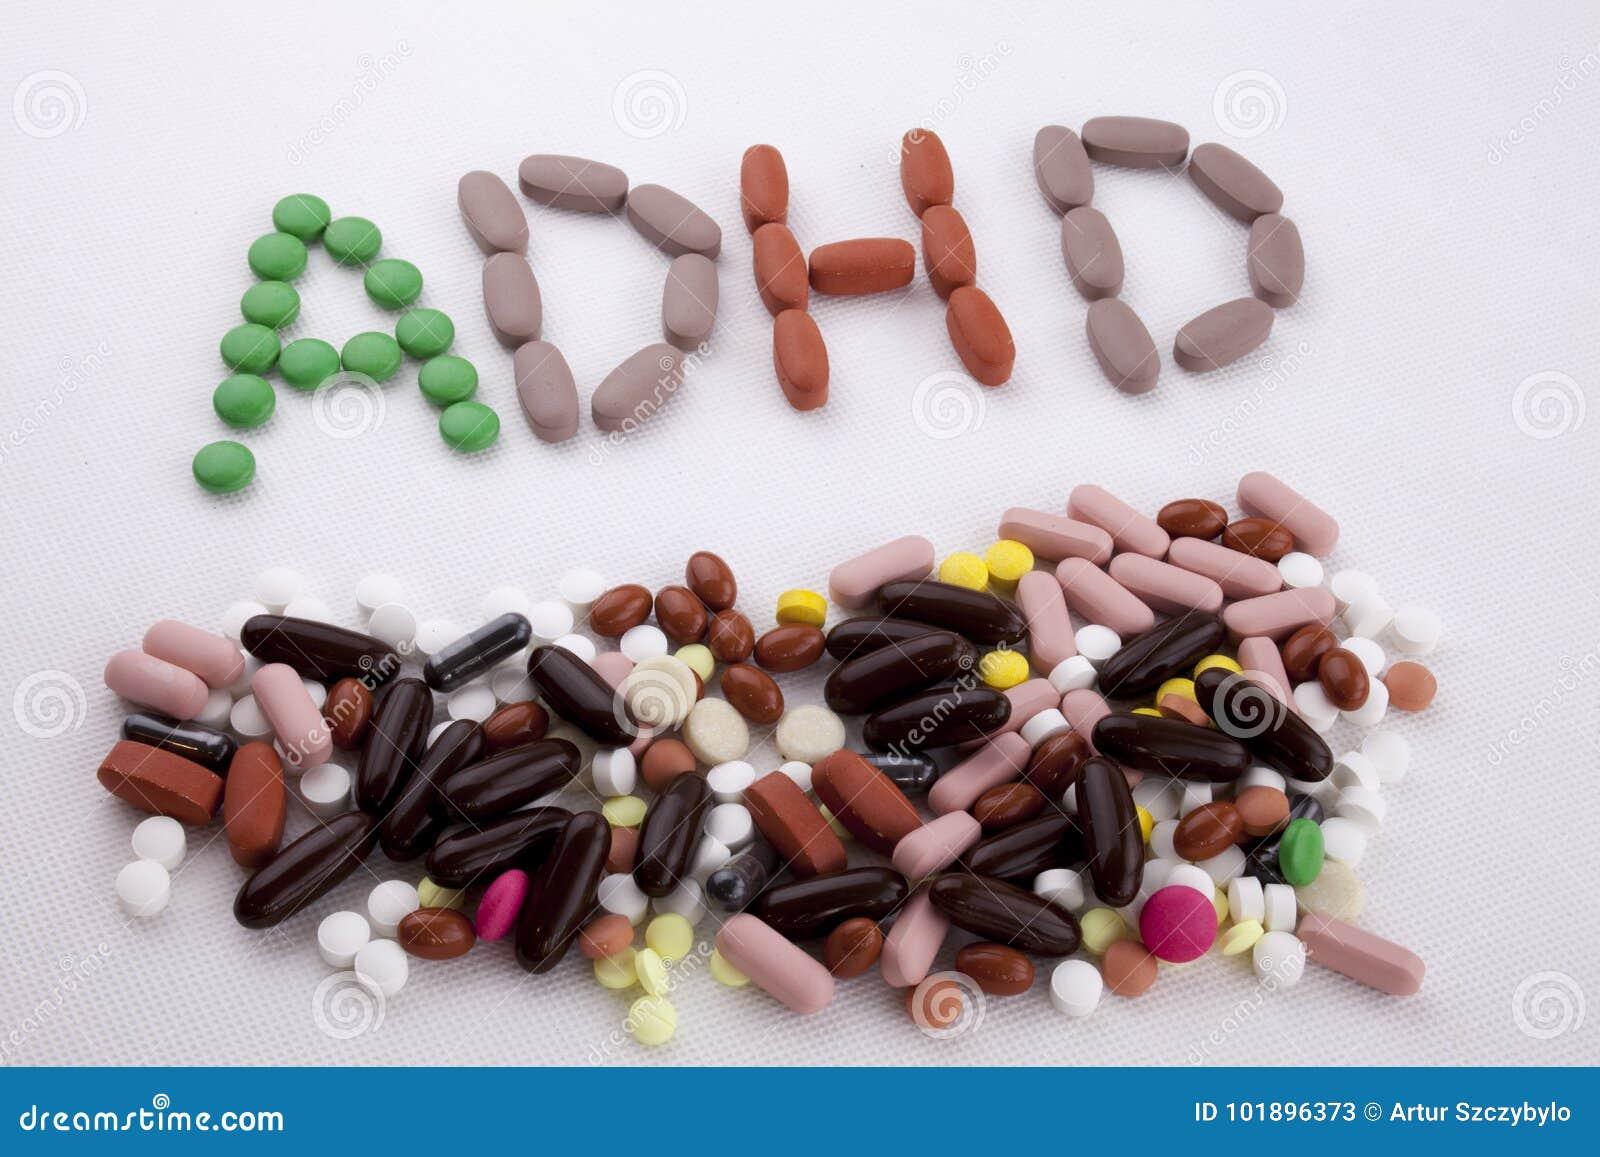 Das Konzept der medizinischen Behandlung der Handschrifttexttitelinspiration, das mit Pillen geschrieben wird, mischt Kapselwort